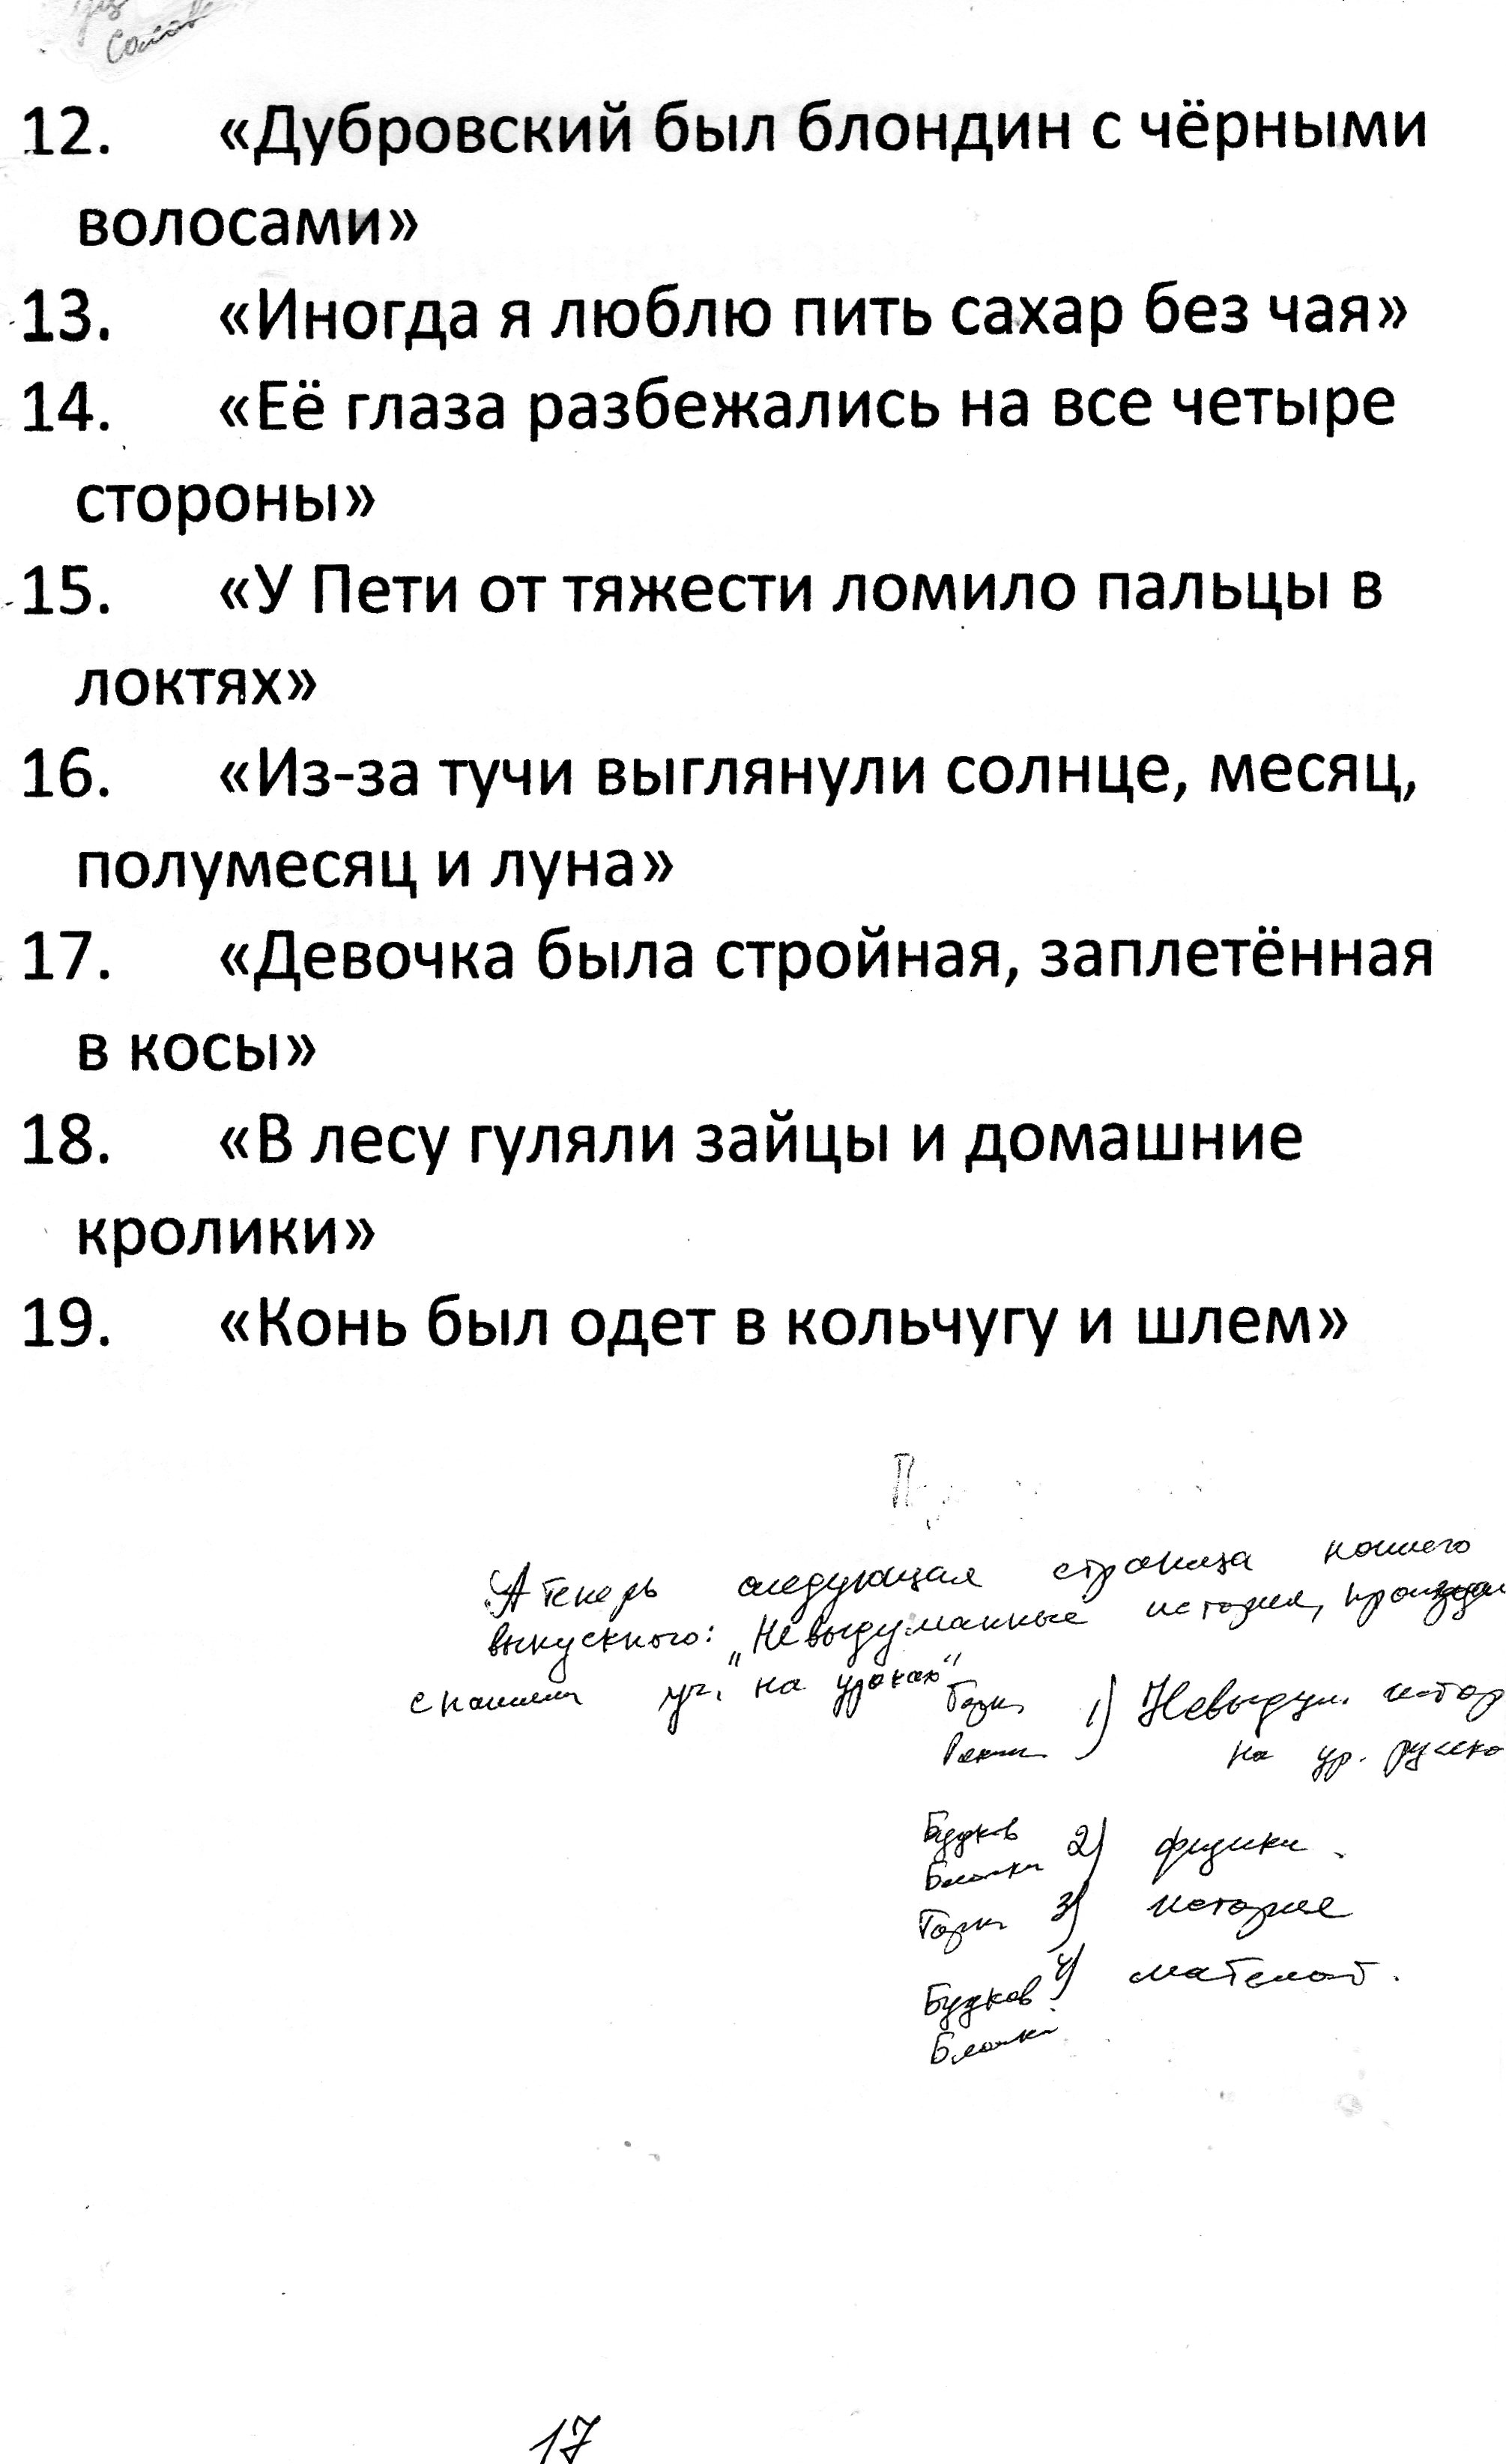 C:\Documents and Settings\ADMIN\Мои документы\9 кл выпускной\img023.jpg